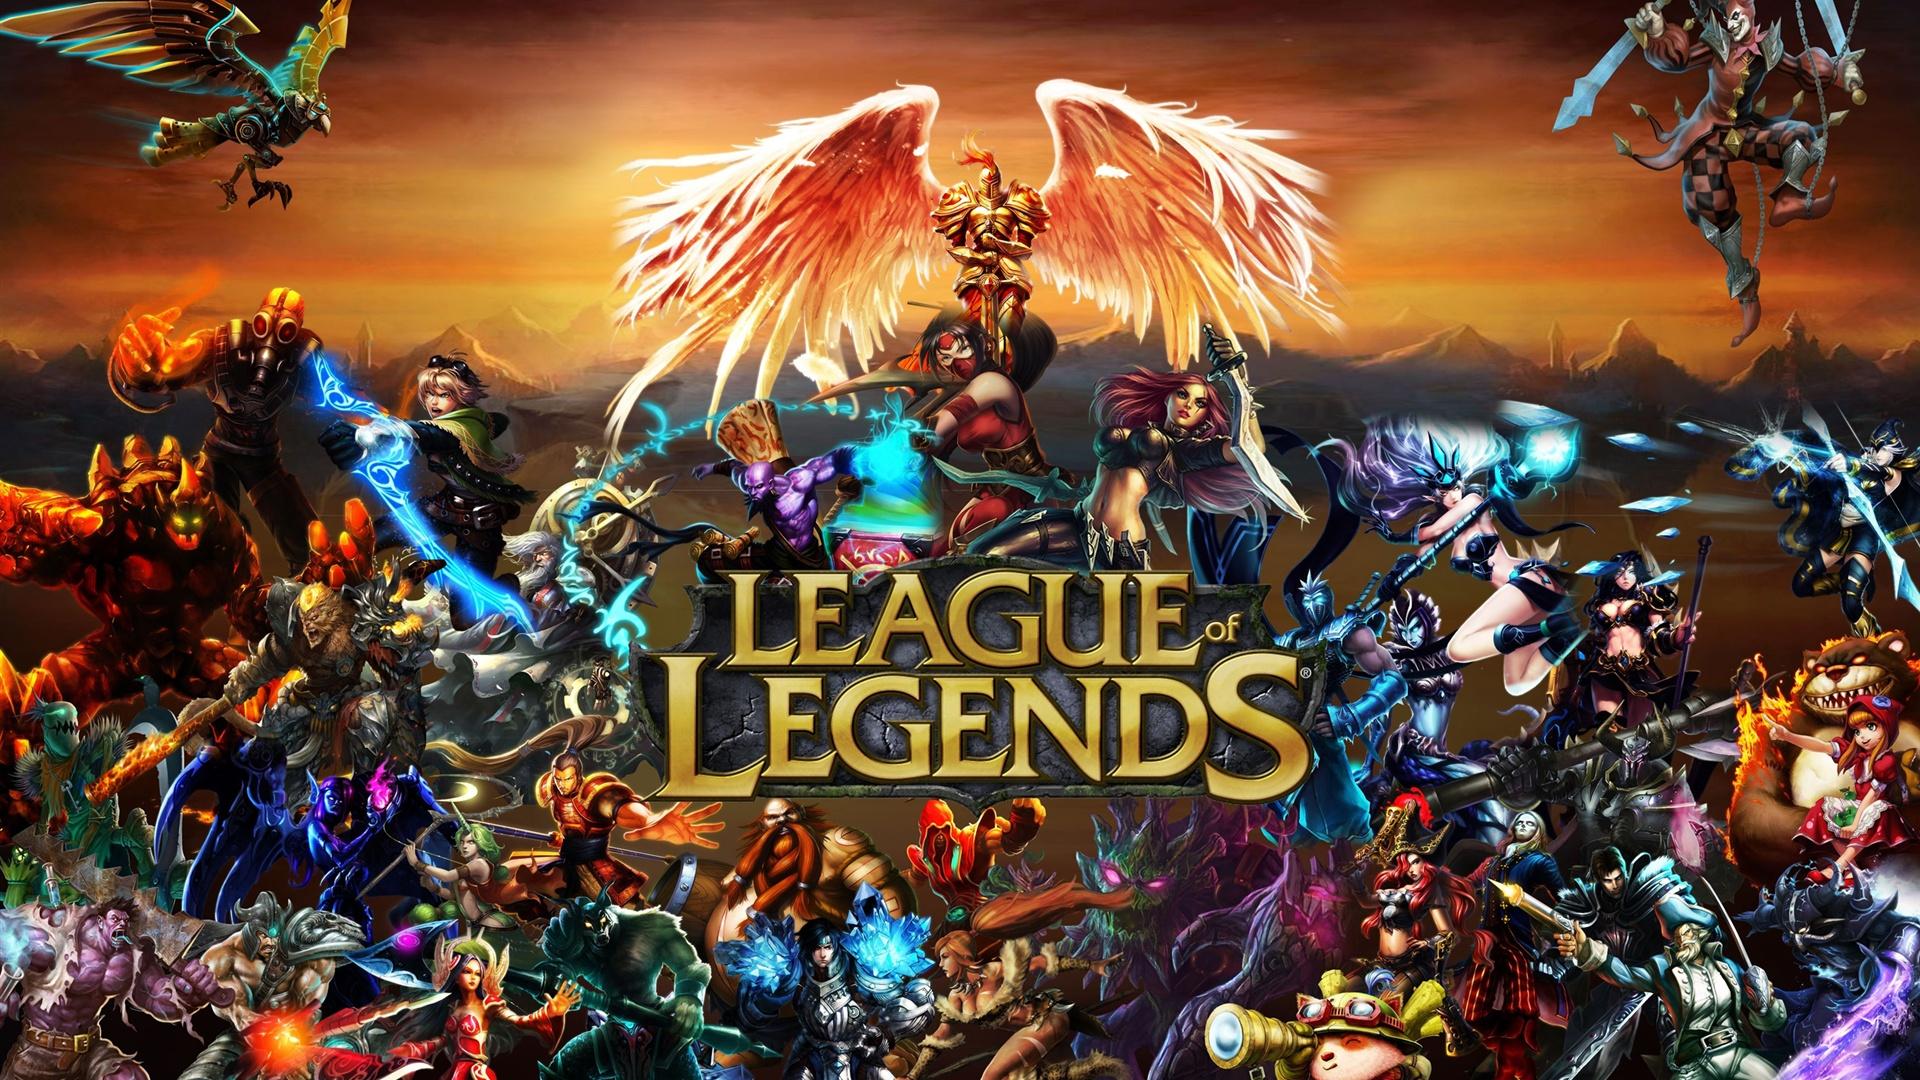 kiwig8a   League of Legends Wallpapers HD 1080p[1]jpg   Detail 1920x1080